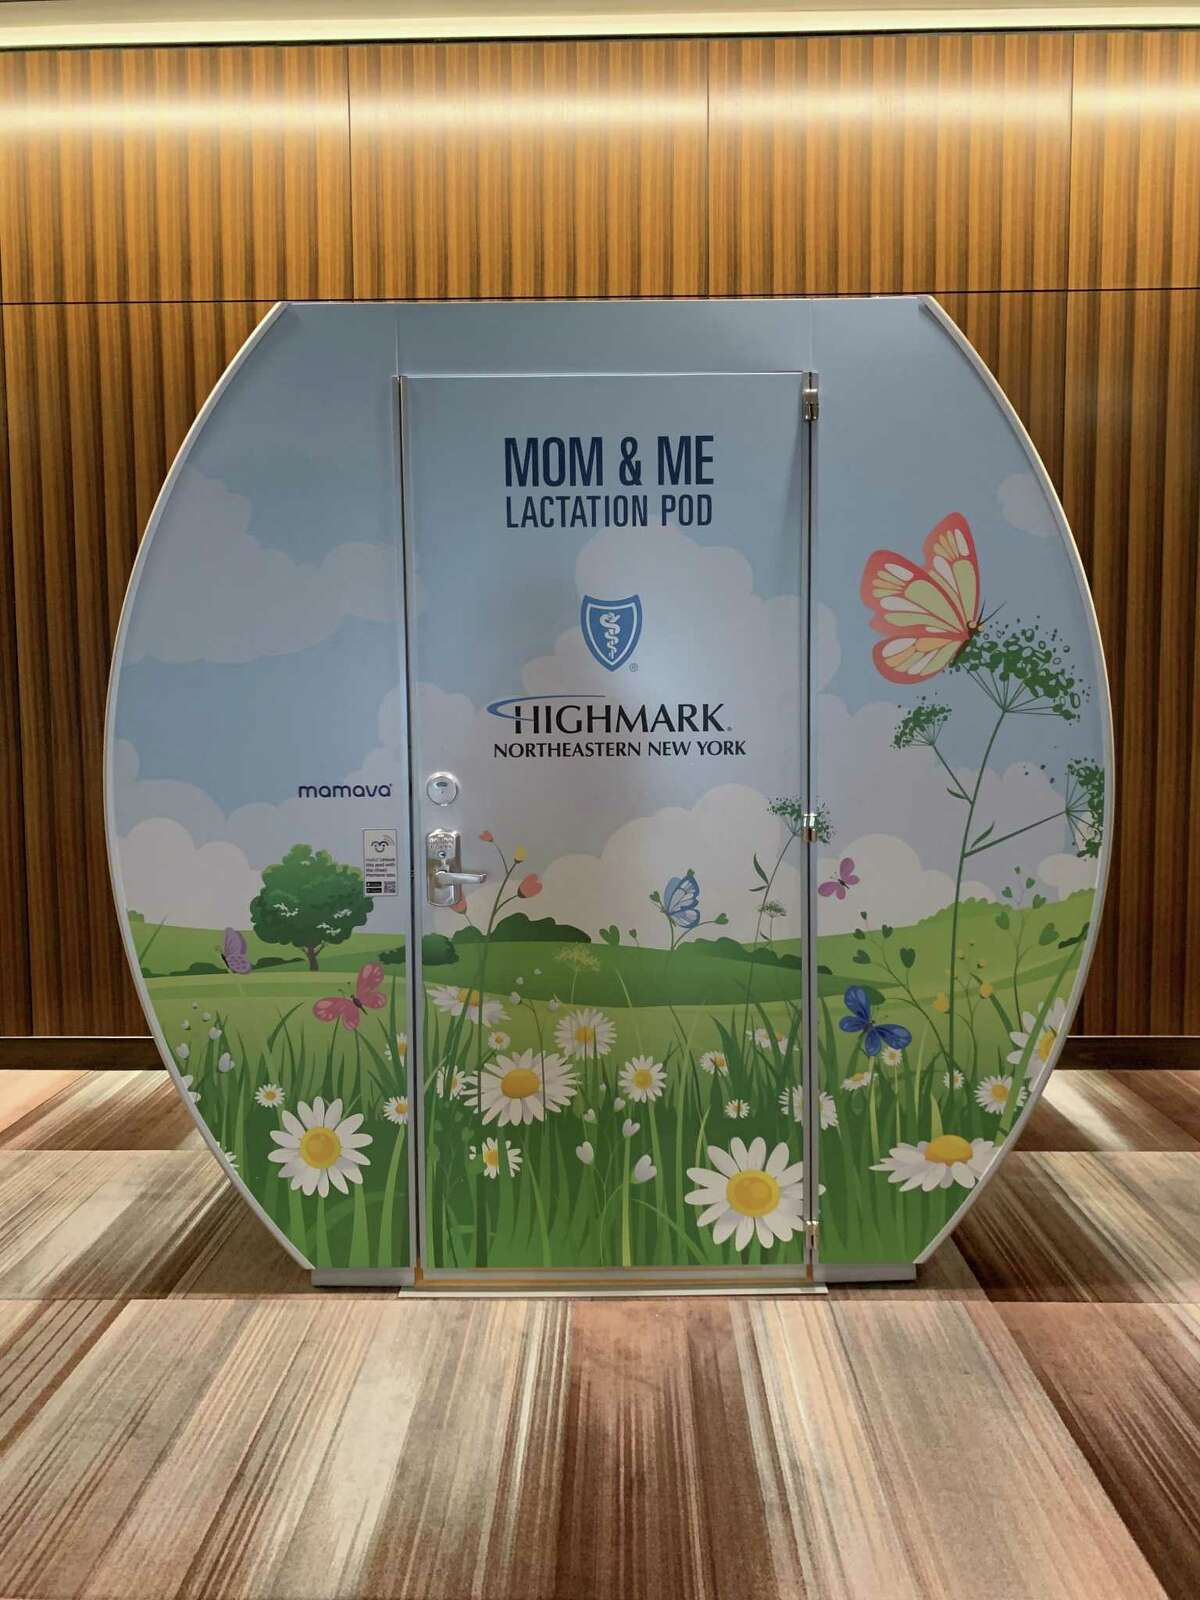 A Mamava lactation pod installed at the Albany Capital Center in September 2021.